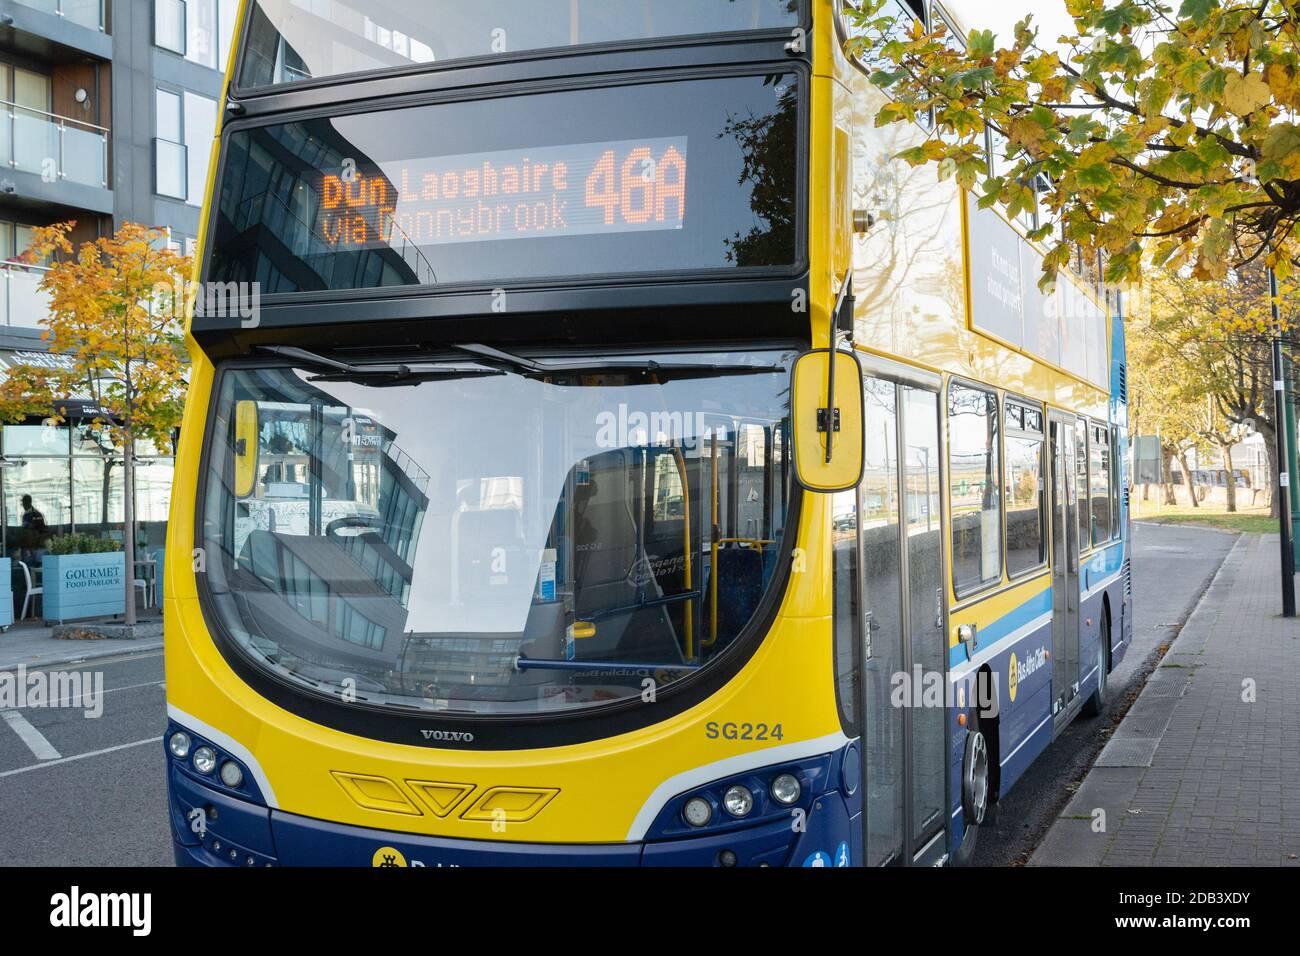 Public transport in Dun Laoghaire in County Dublin, Ireland Stock Photo